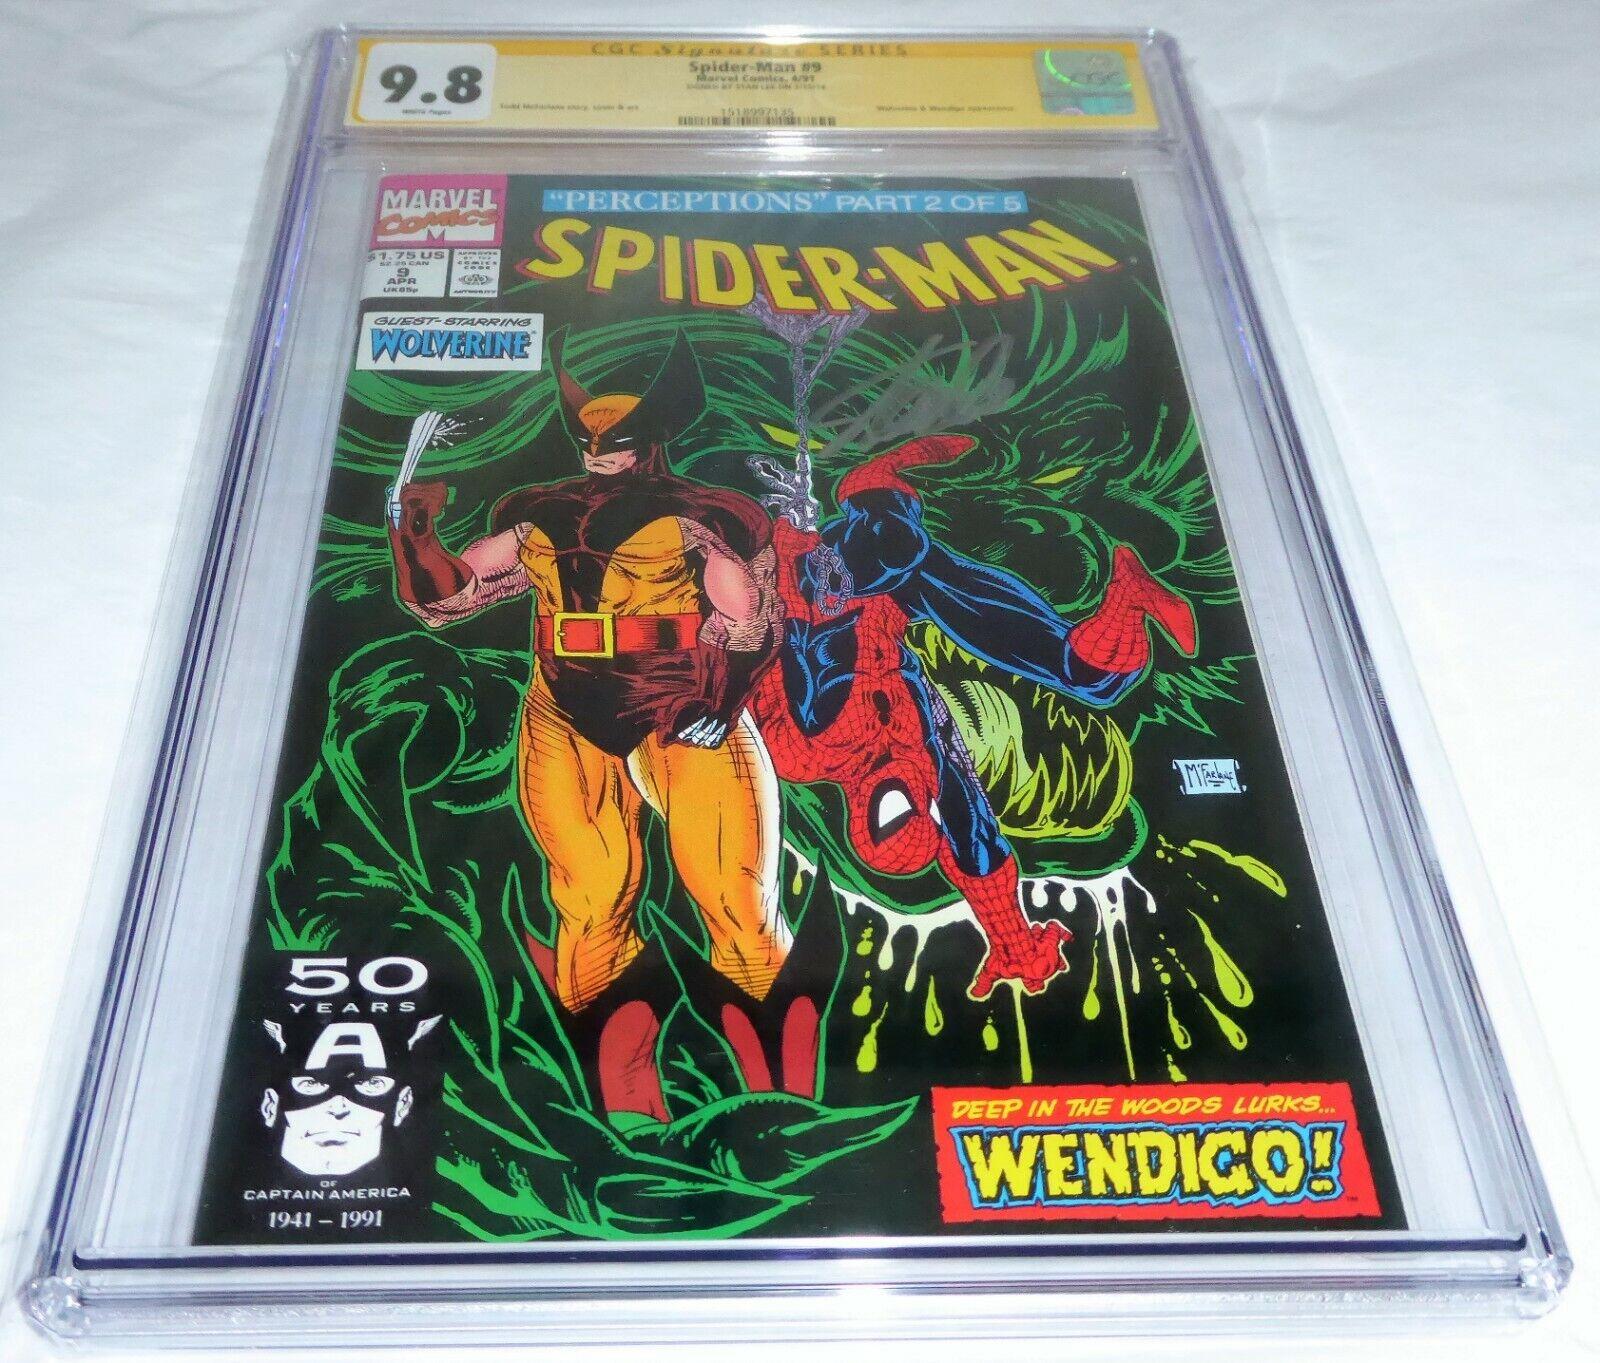 Spider-Man #9 CGC SS Signature Autograph STAN LEE Wolverine Wendigo Appearance